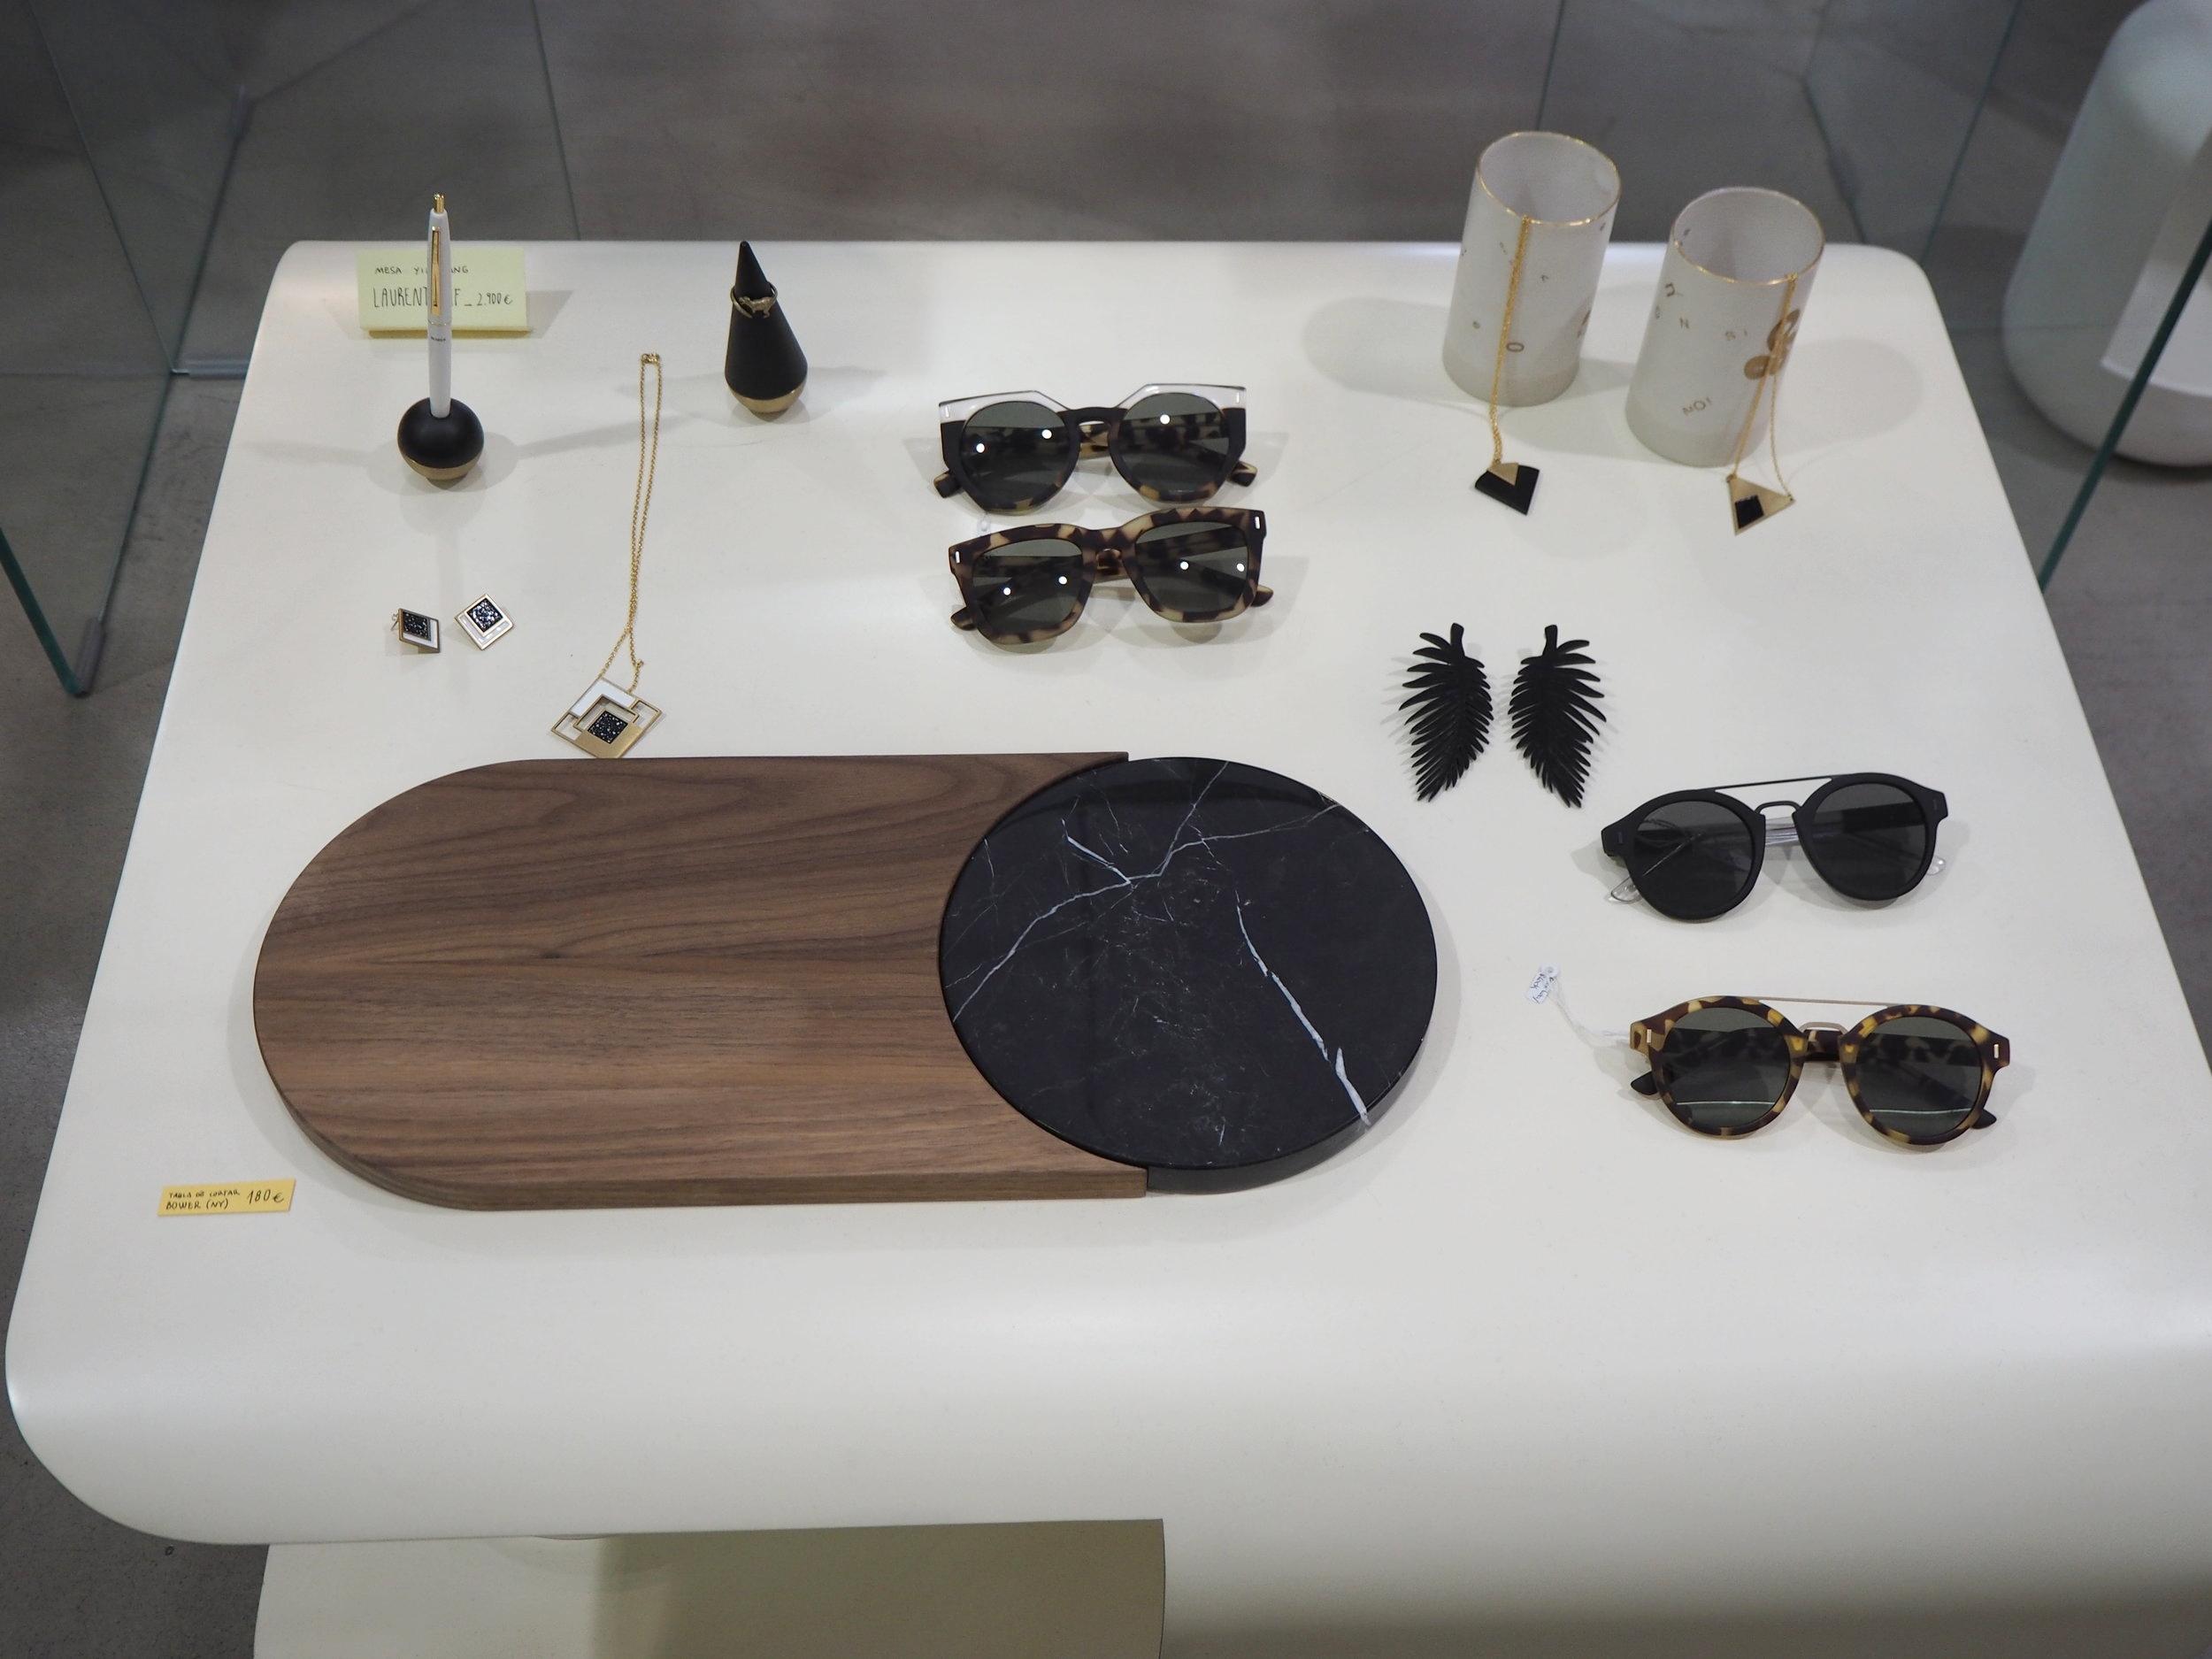 tiendas-ropa-madrid-originles-rughara-accesorios.JPG